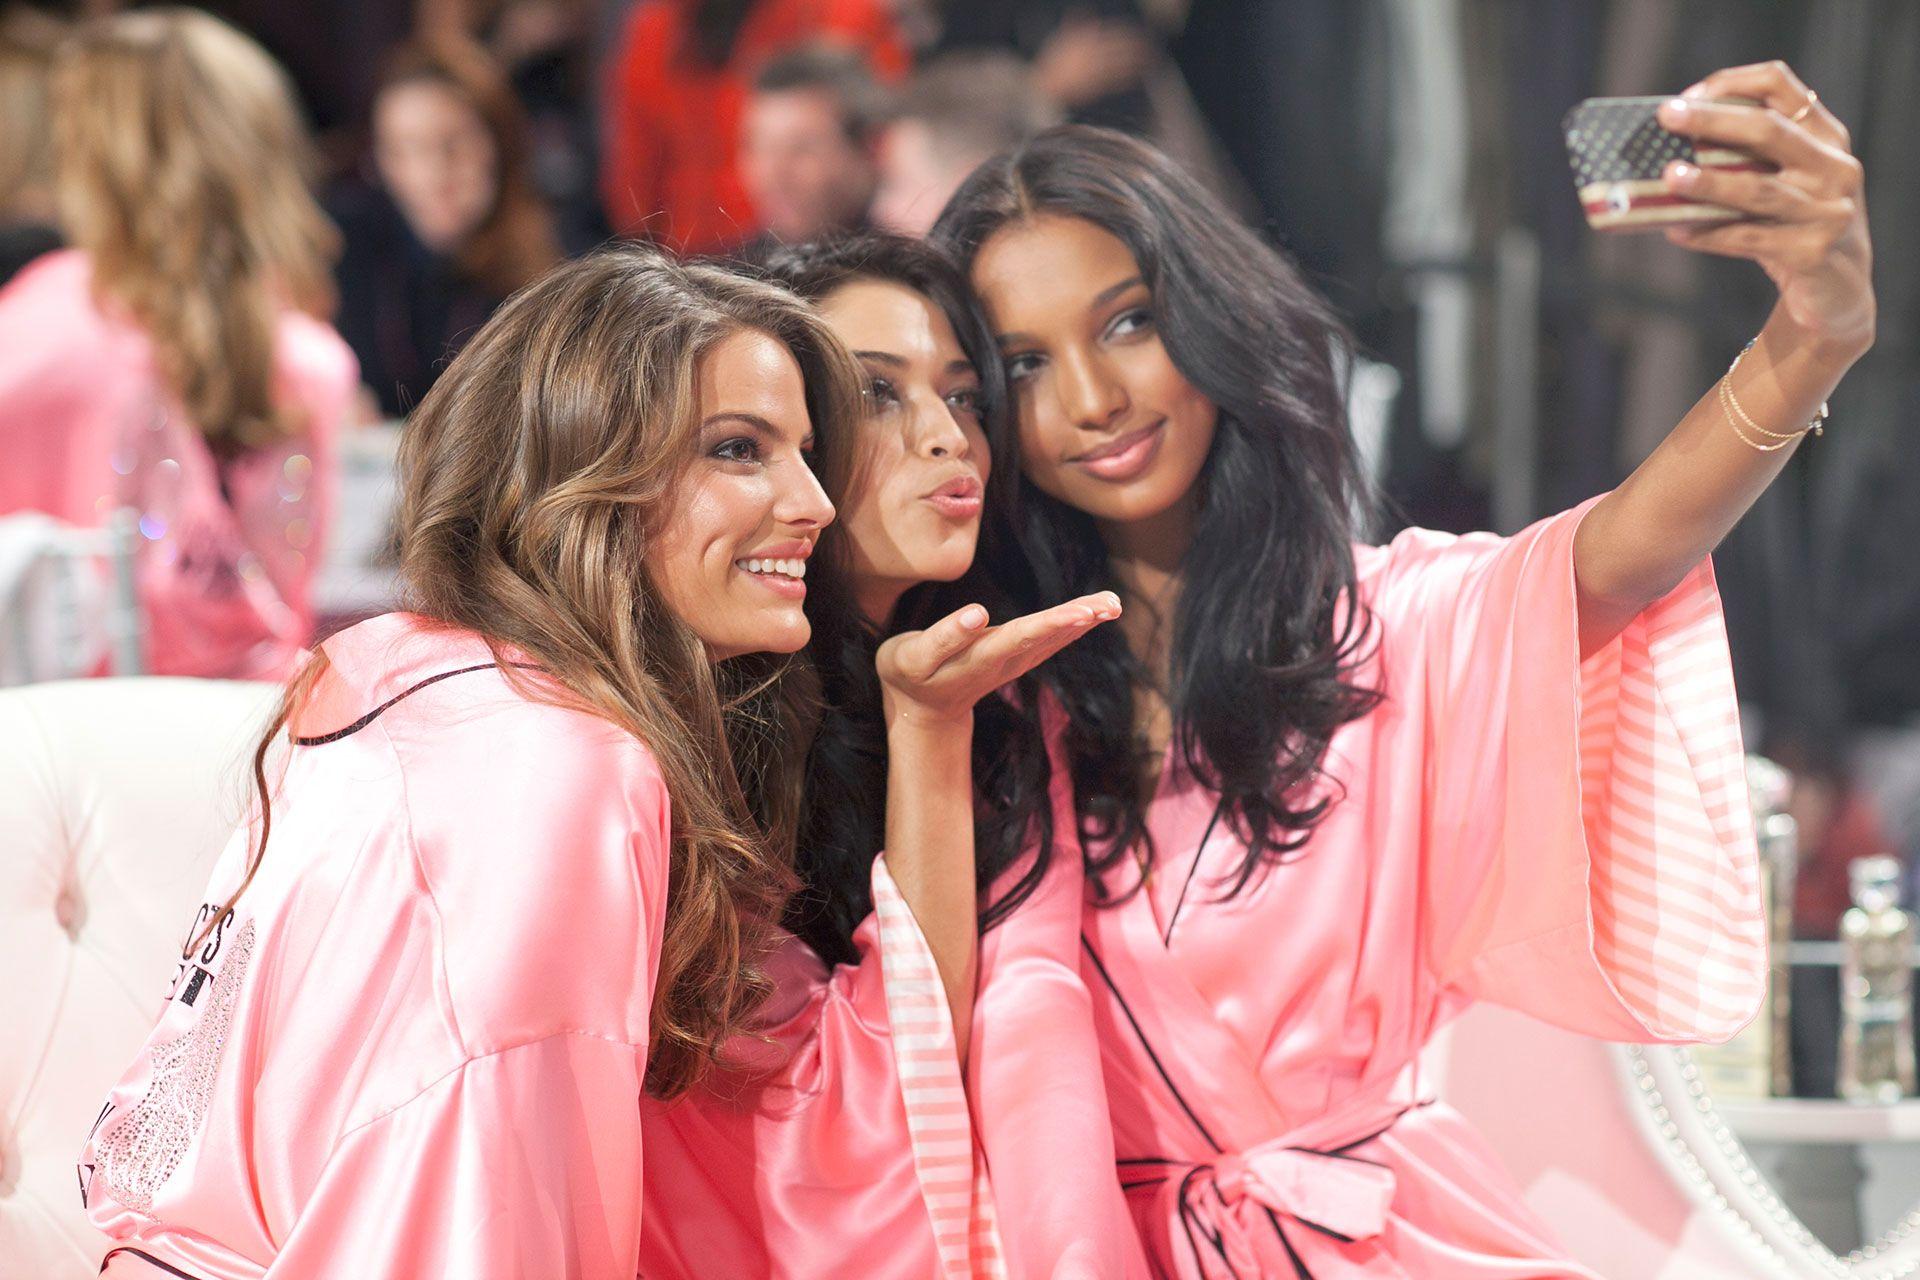 f217e2ec2dcba Backstage Photos from the 2012 Victoria's Secret Fashion Show ...